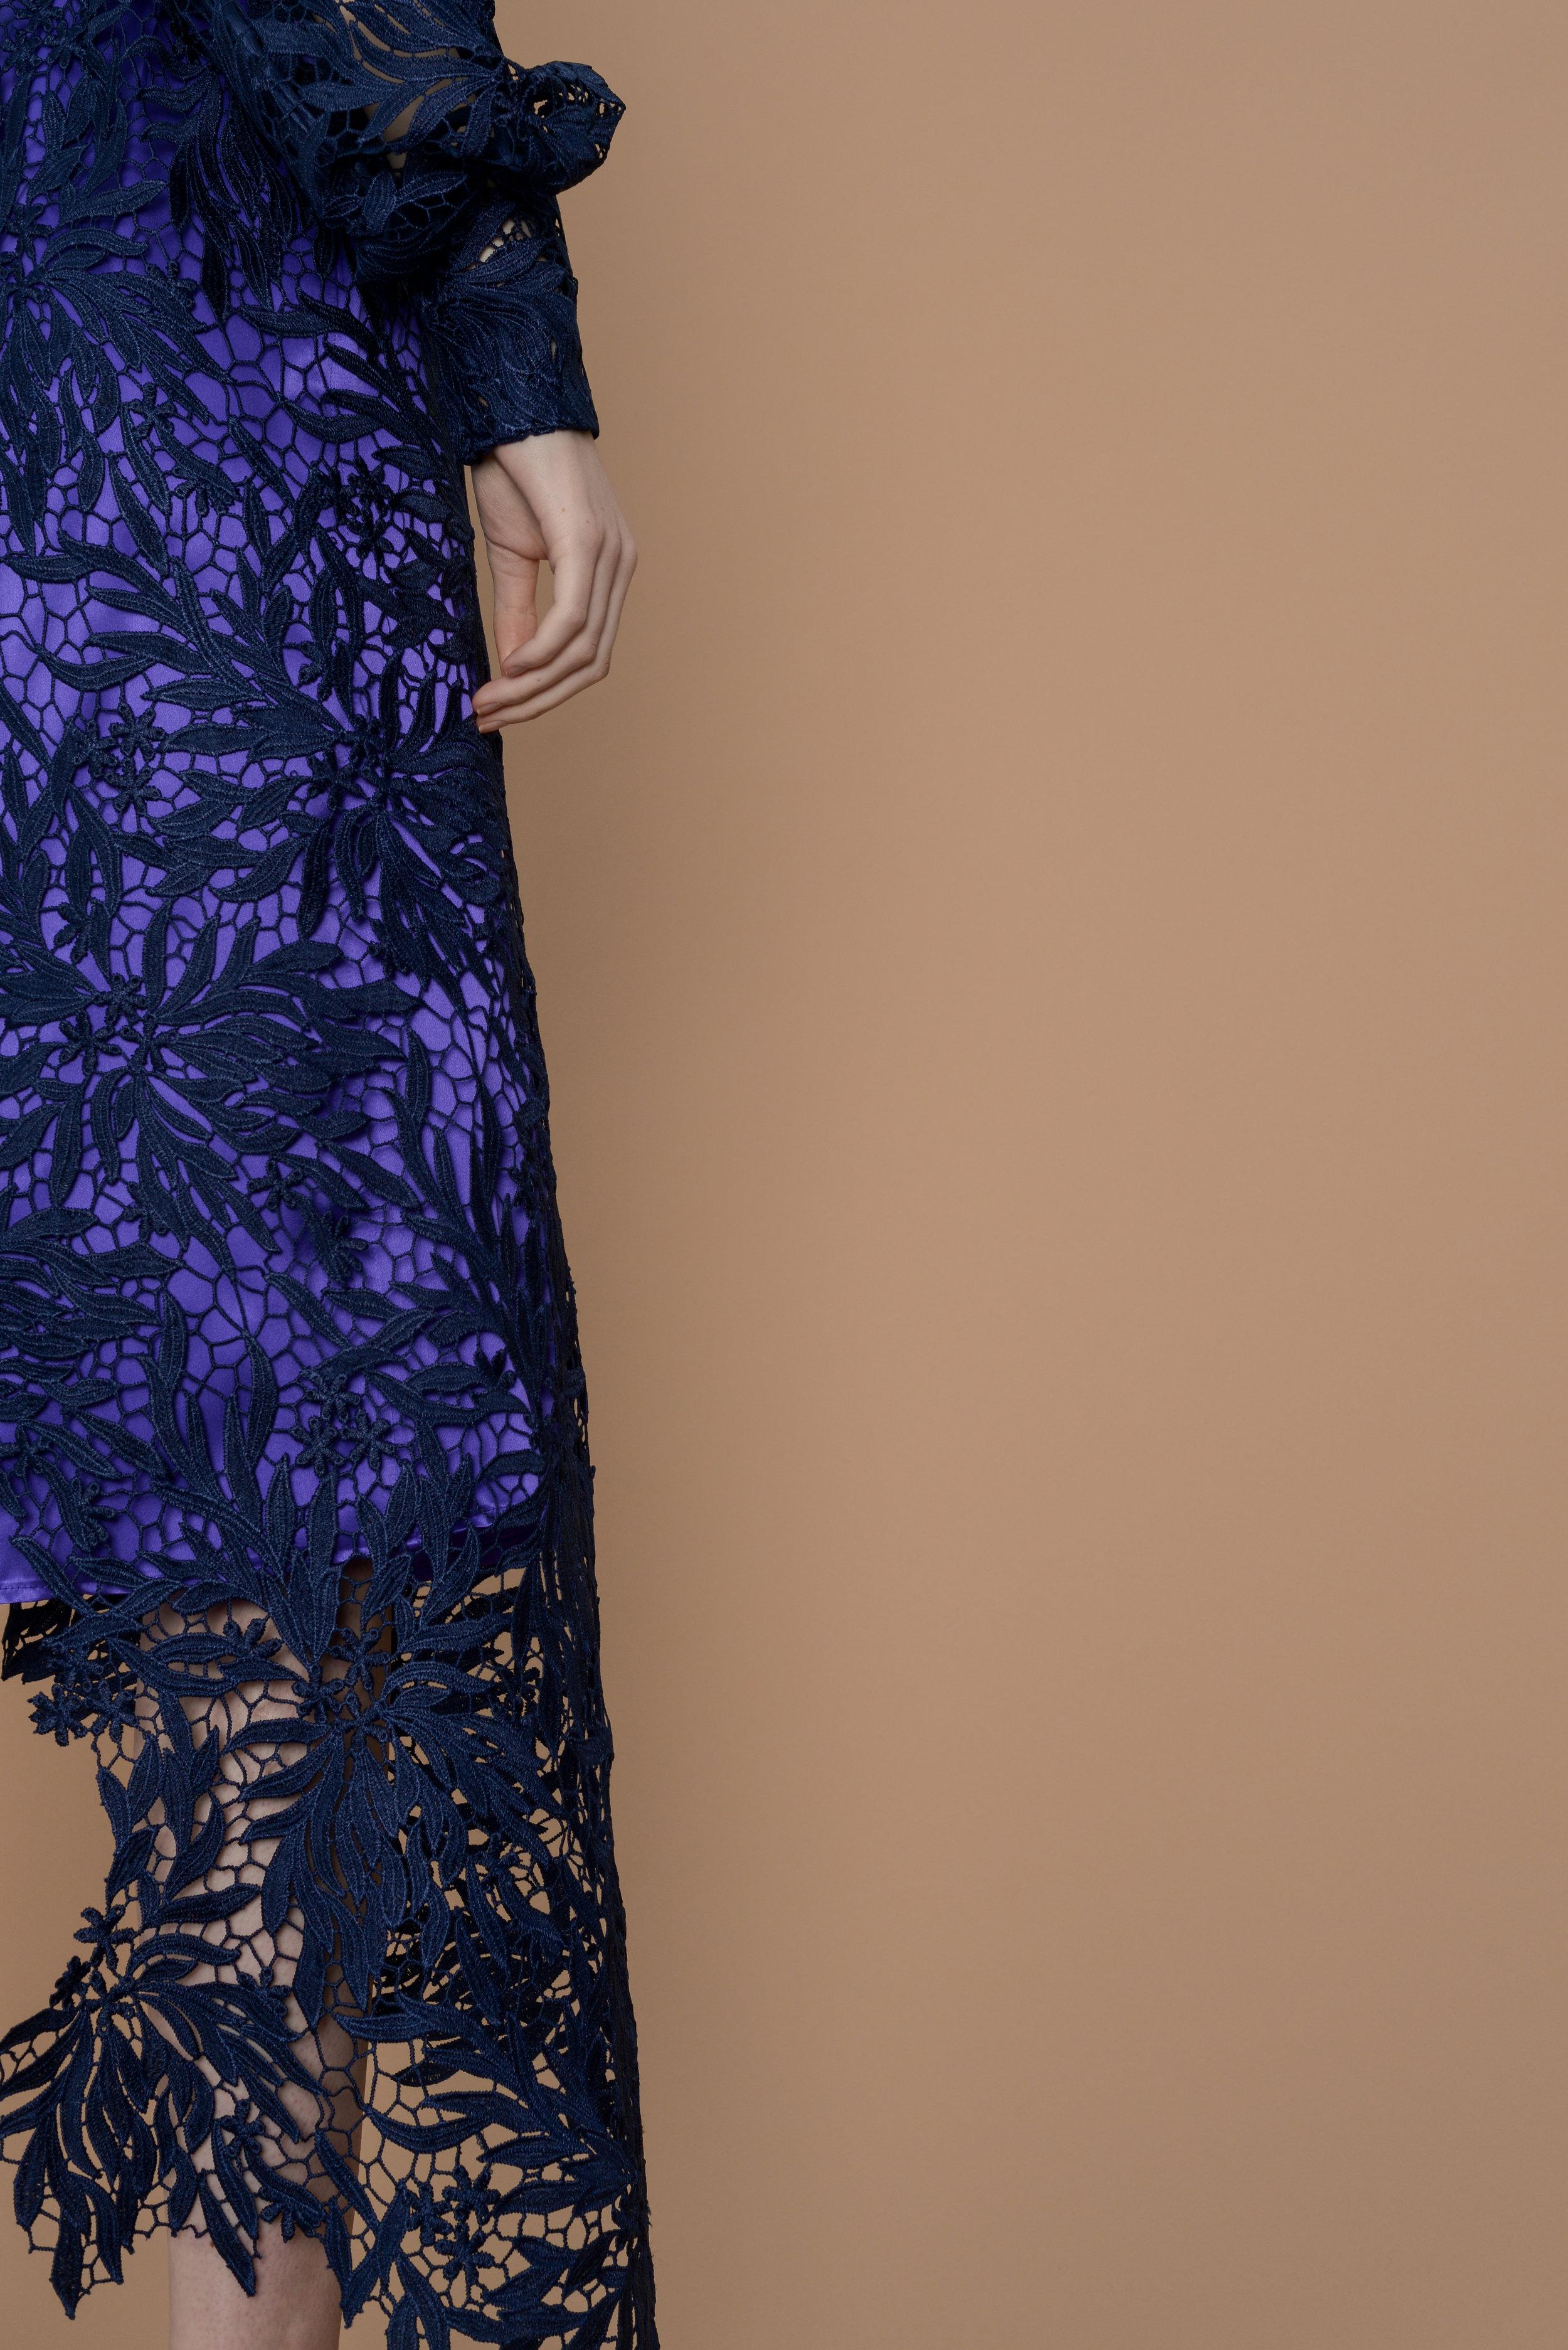 Drust Wrap Dress - Violet satin